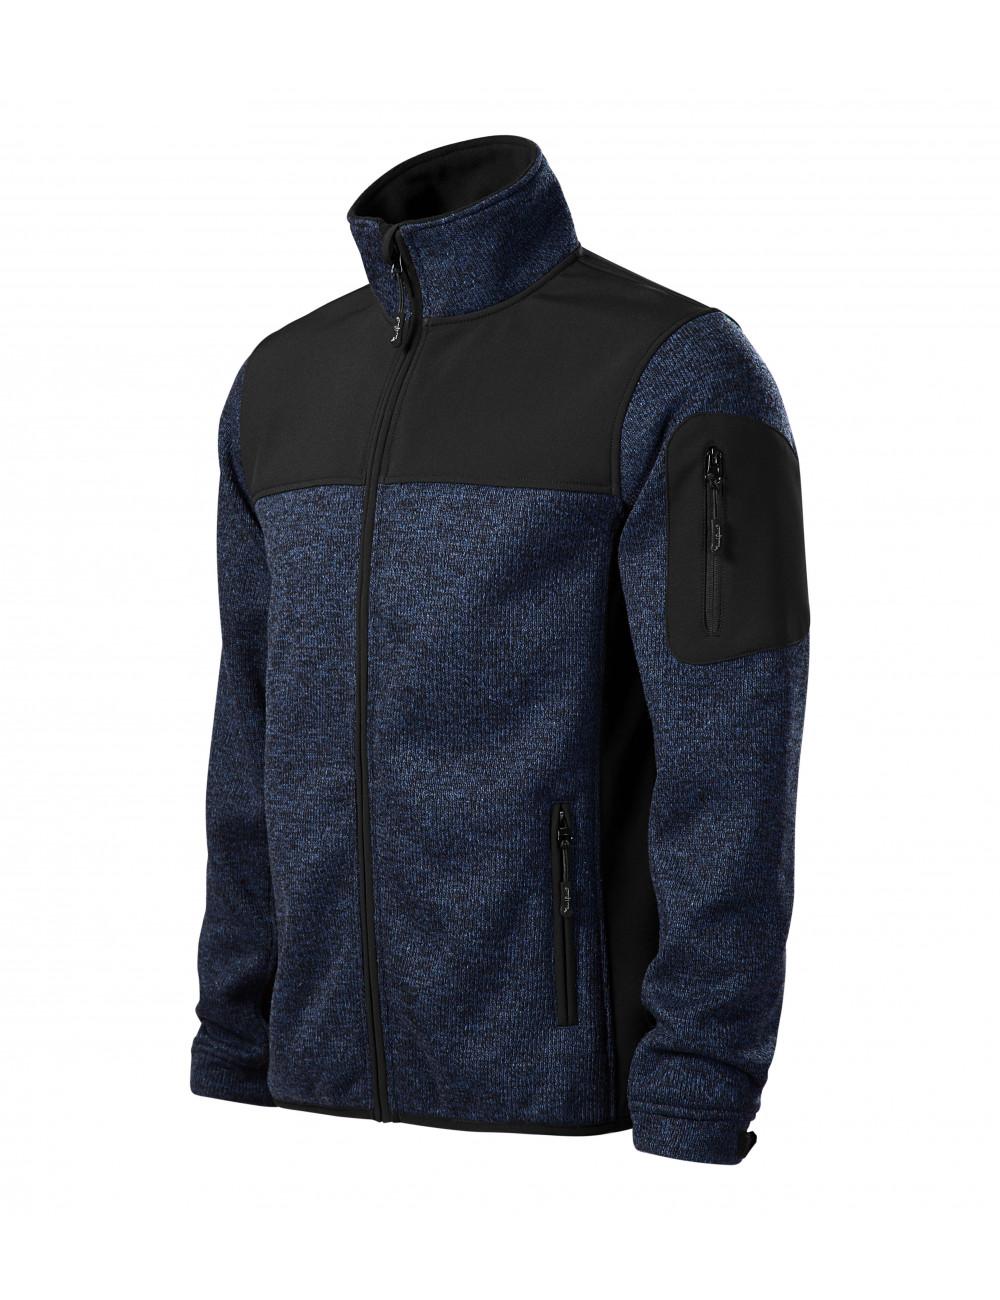 Adler MALFINIPREMIUM Softshell kurtka męska Casual 550 knit blue